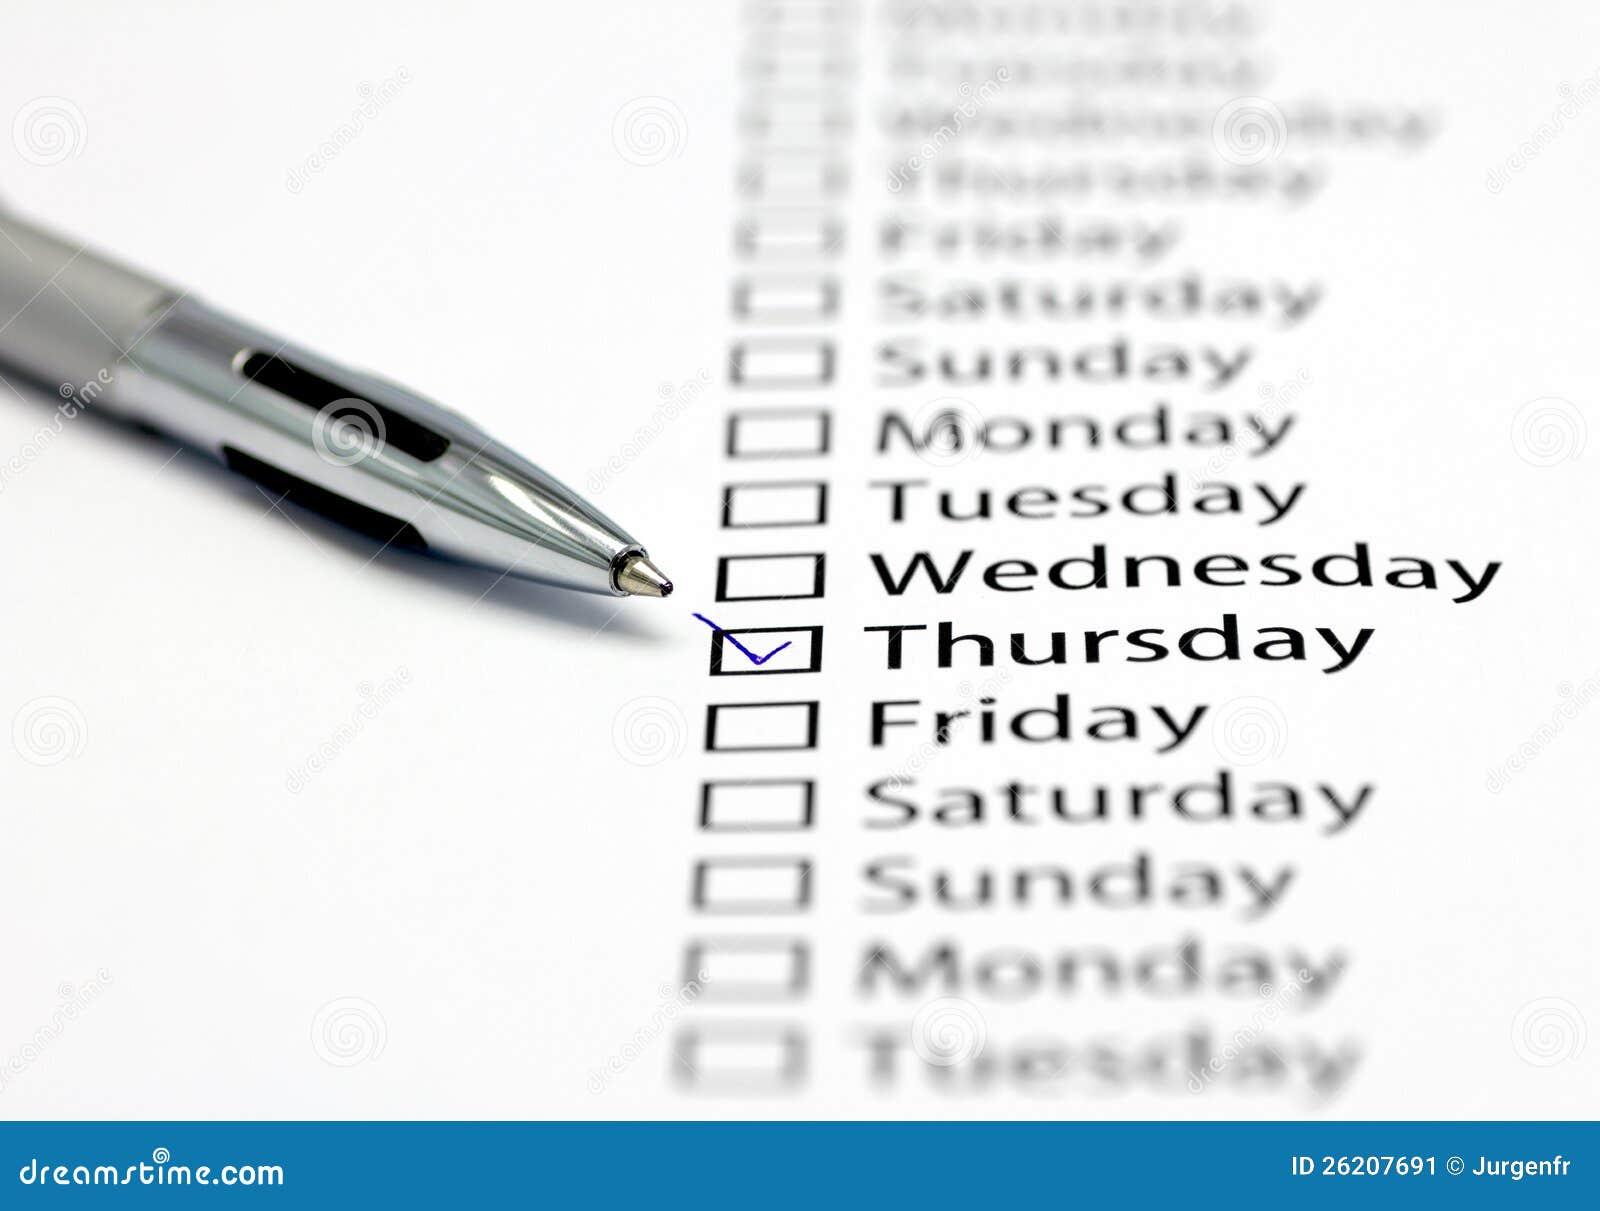 Desk Calendar Design : It s thursday today stock image